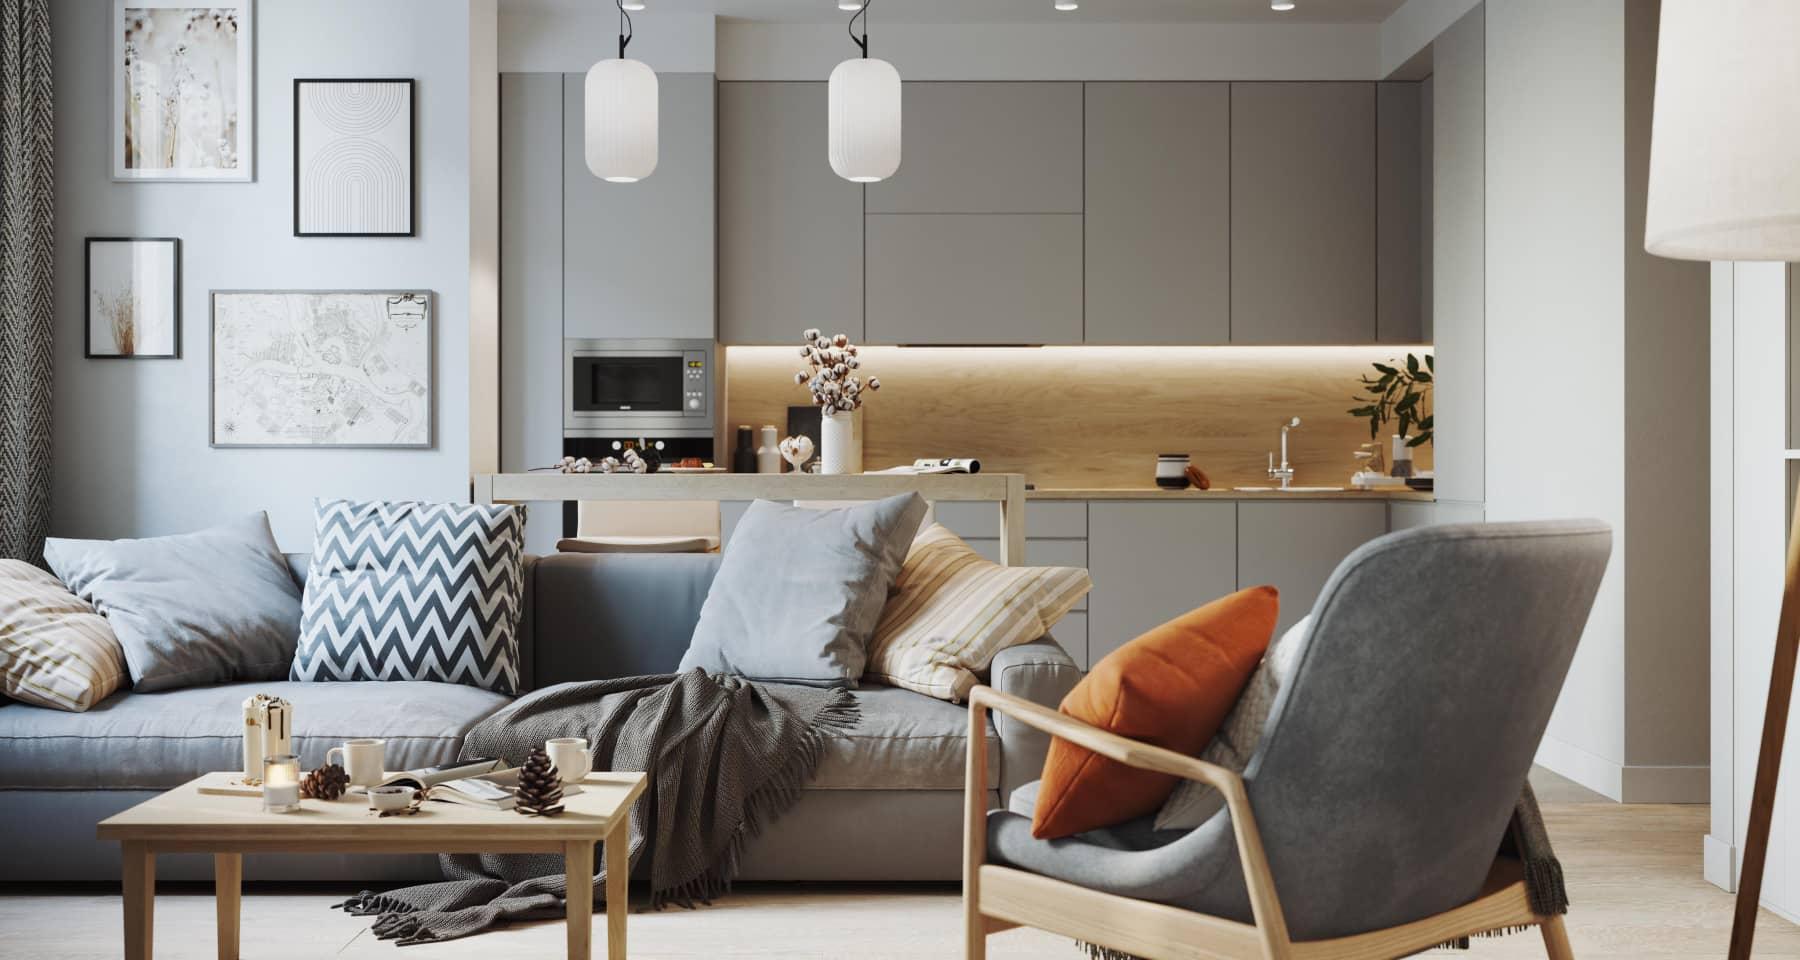 Дизайн двухкомнатной квартиры 60 кв. м